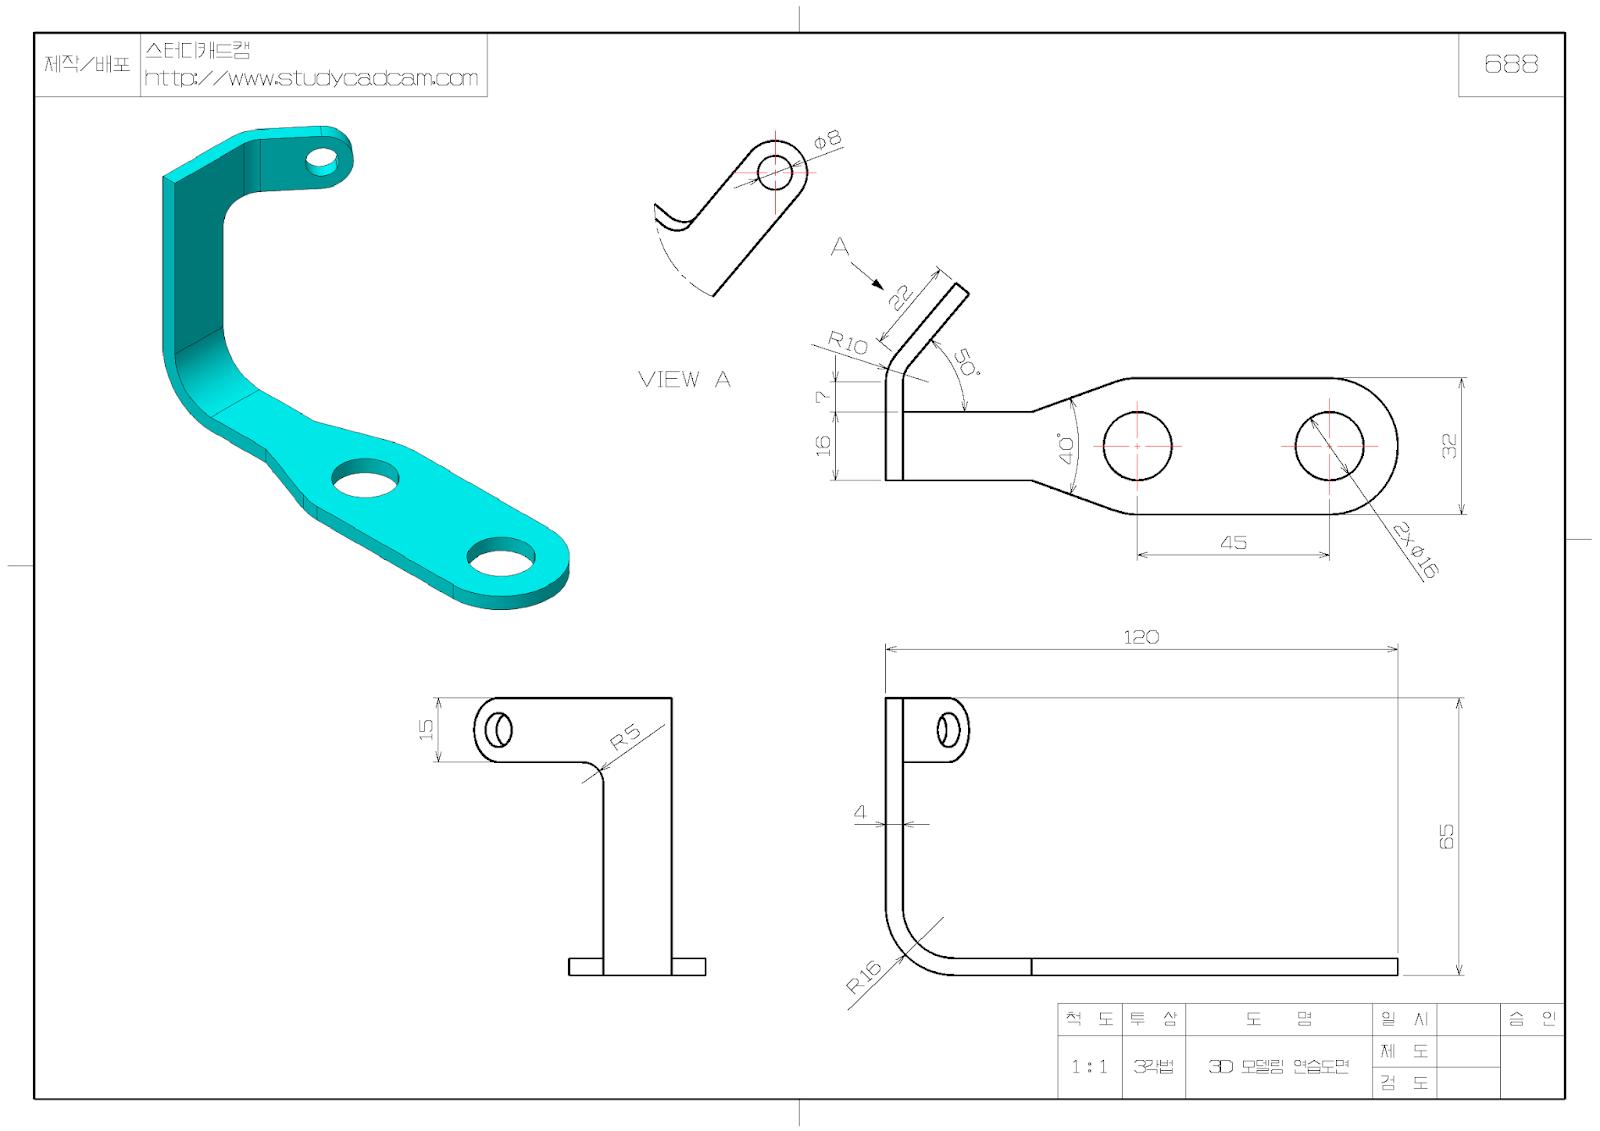 3d Modeling Practice 698 Study Cadcam Solidworks Sheet Metal Drawing Industrial Design Sketch